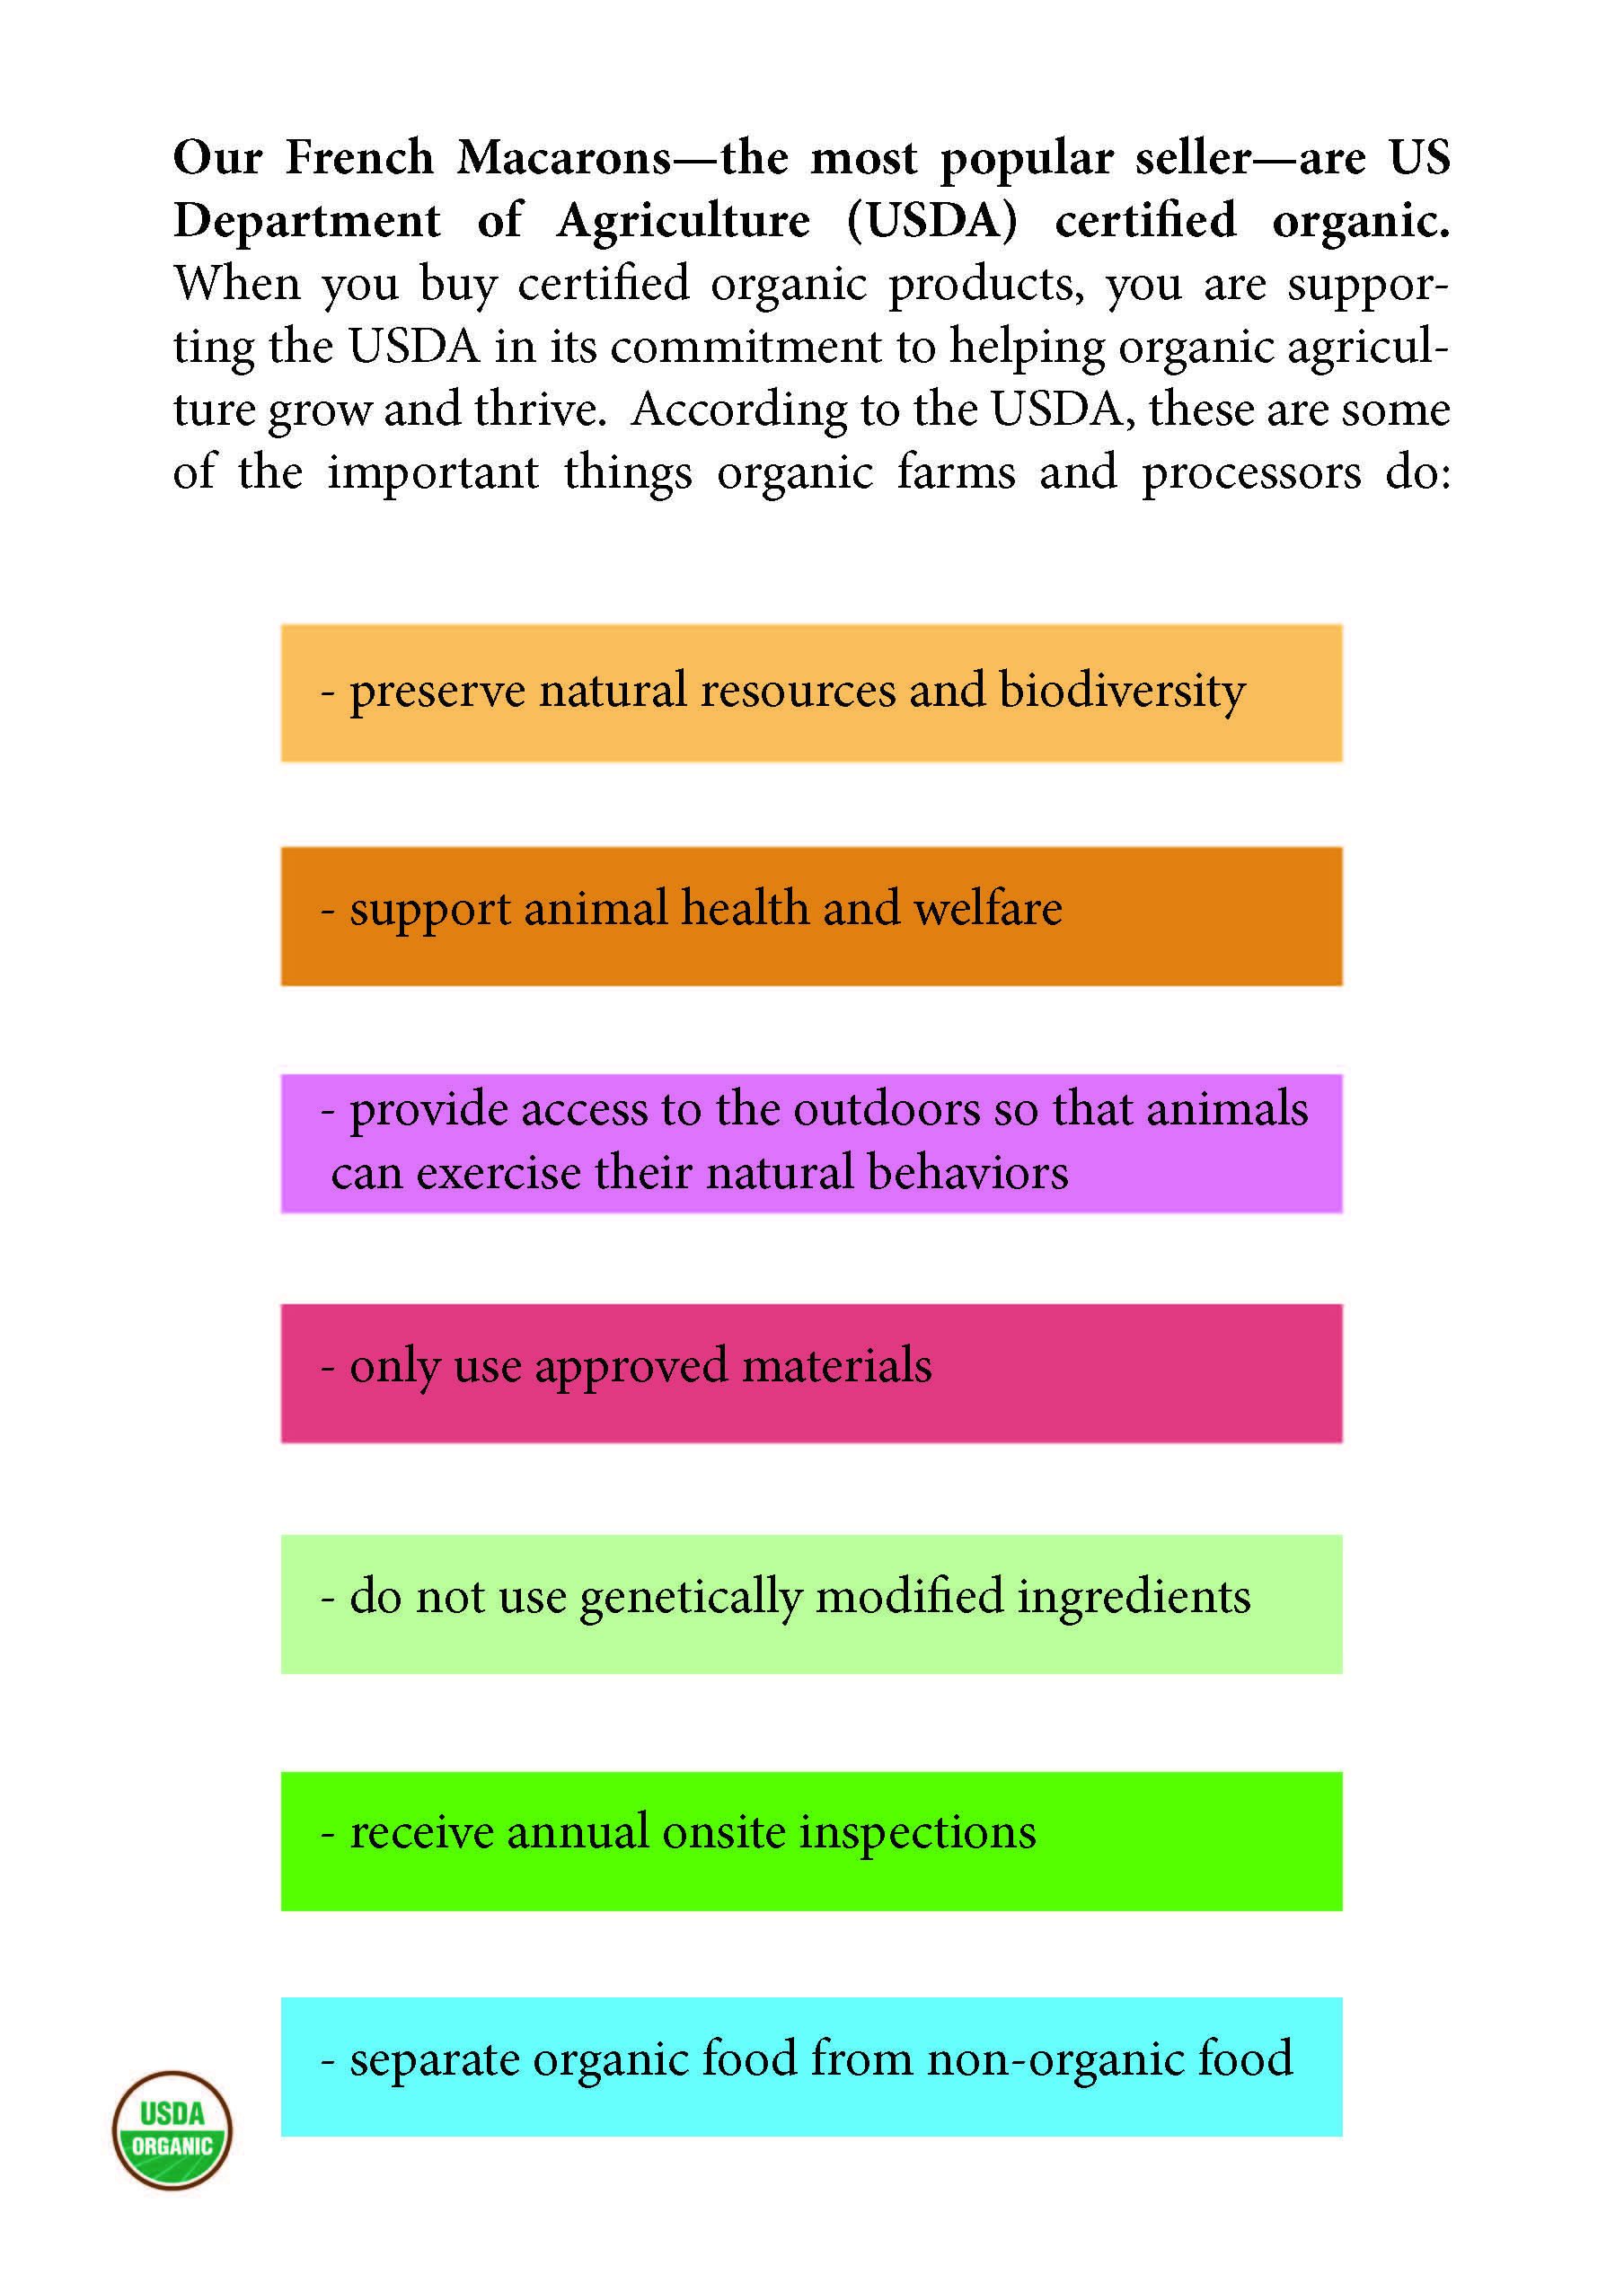 livret-organic-page-05.jpg